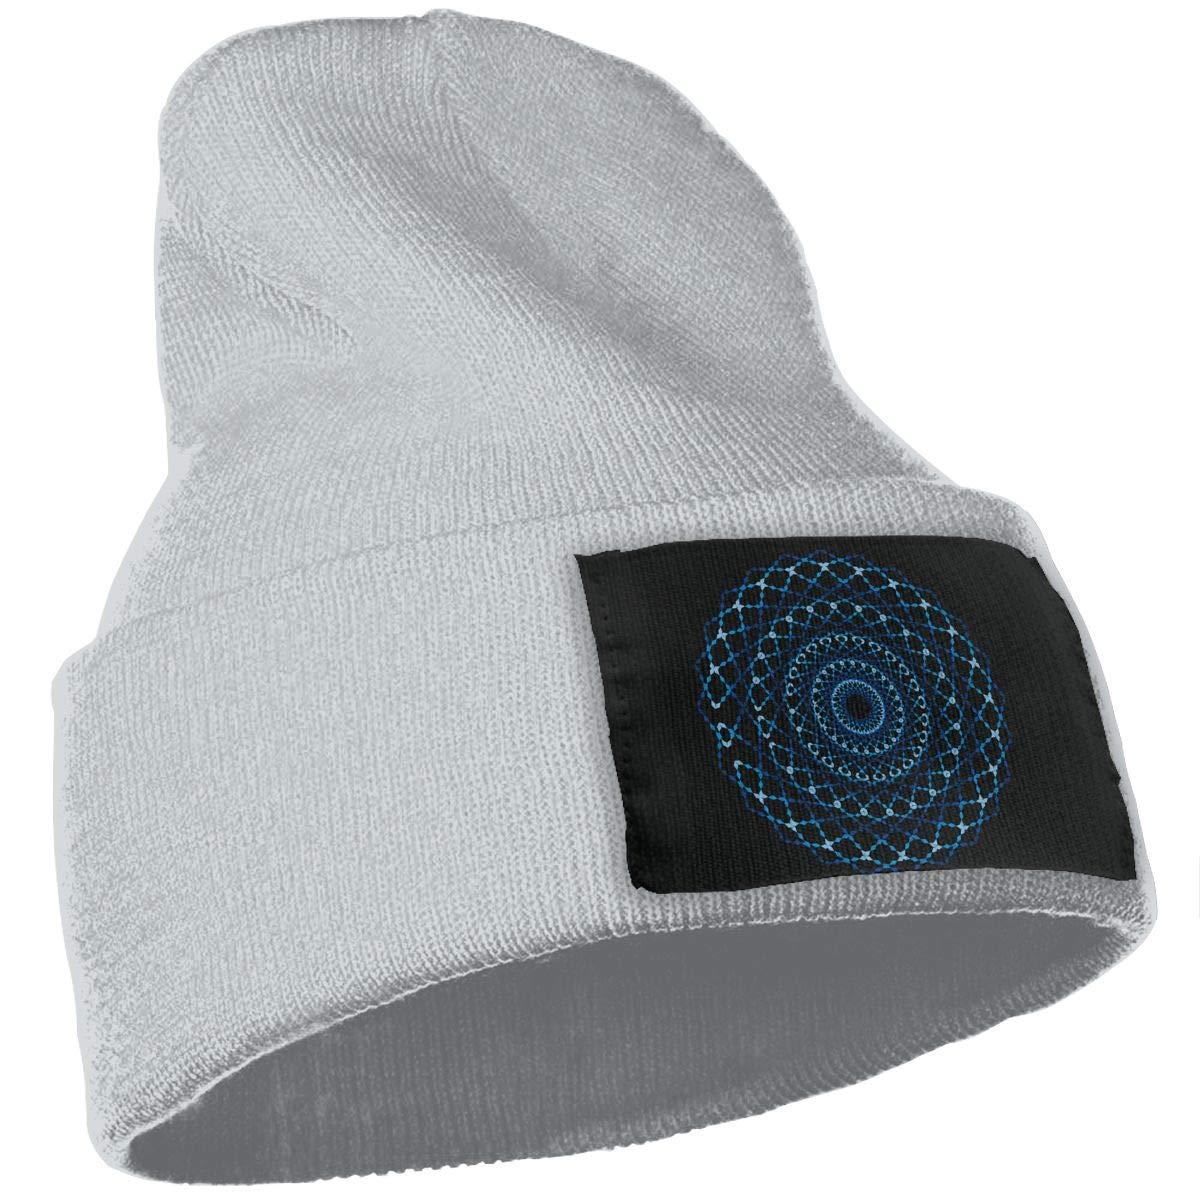 SLADDD1 Circle Pollution Symbol Warm Winter Hat Knit Beanie Skull Cap Cuff Beanie Hat Winter Hats for Men /& Women